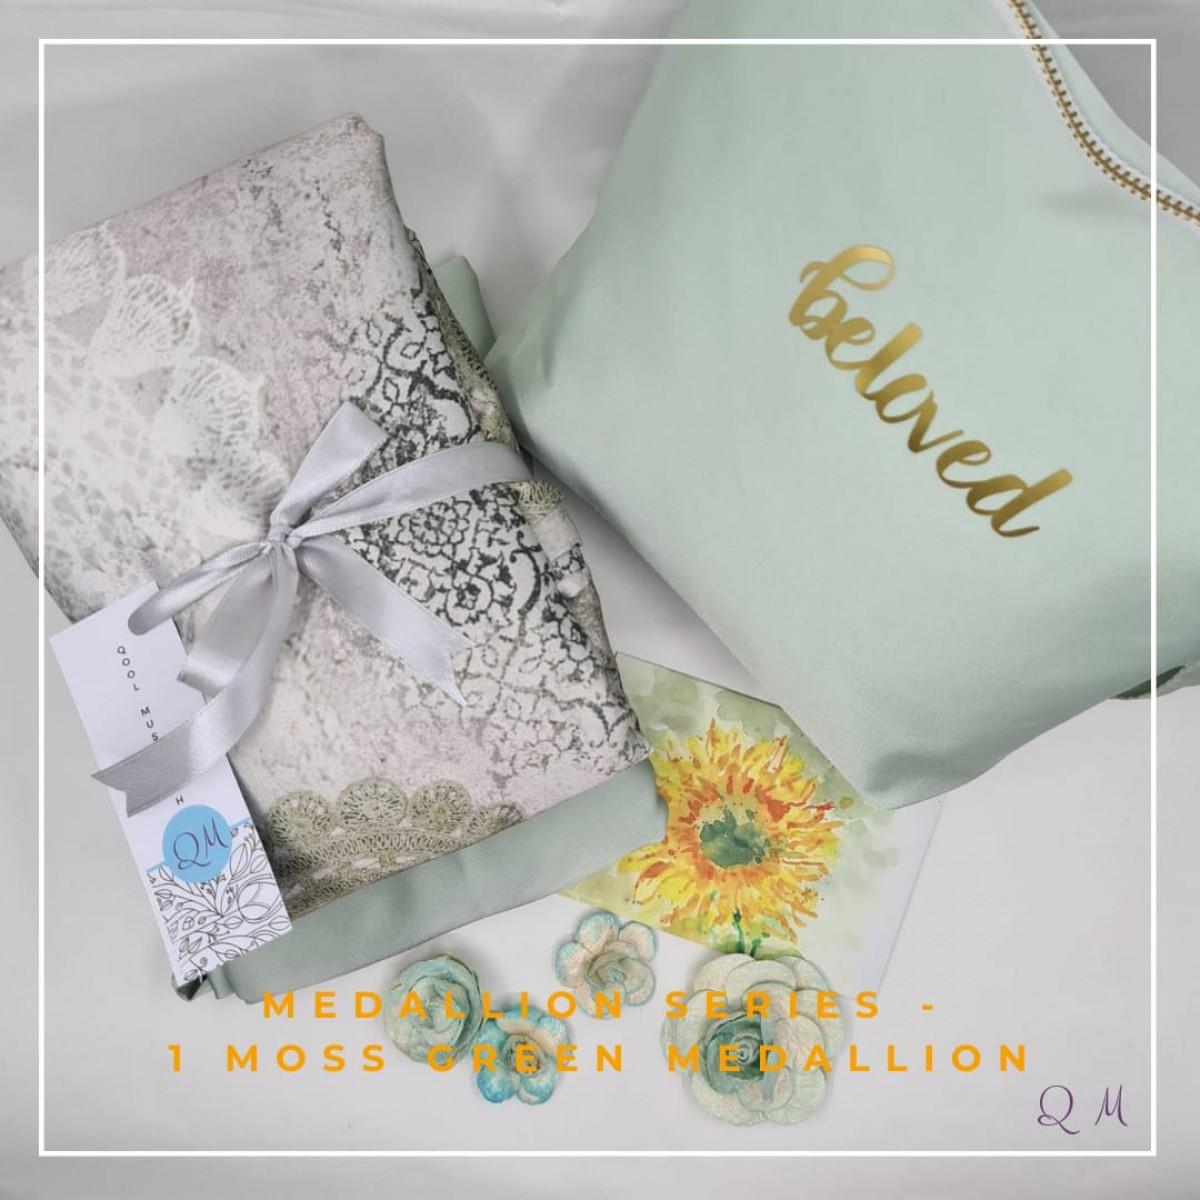 P14. Telekung Armani Silk Medallion Series - Moss Green Medallion - Qool Muslimah